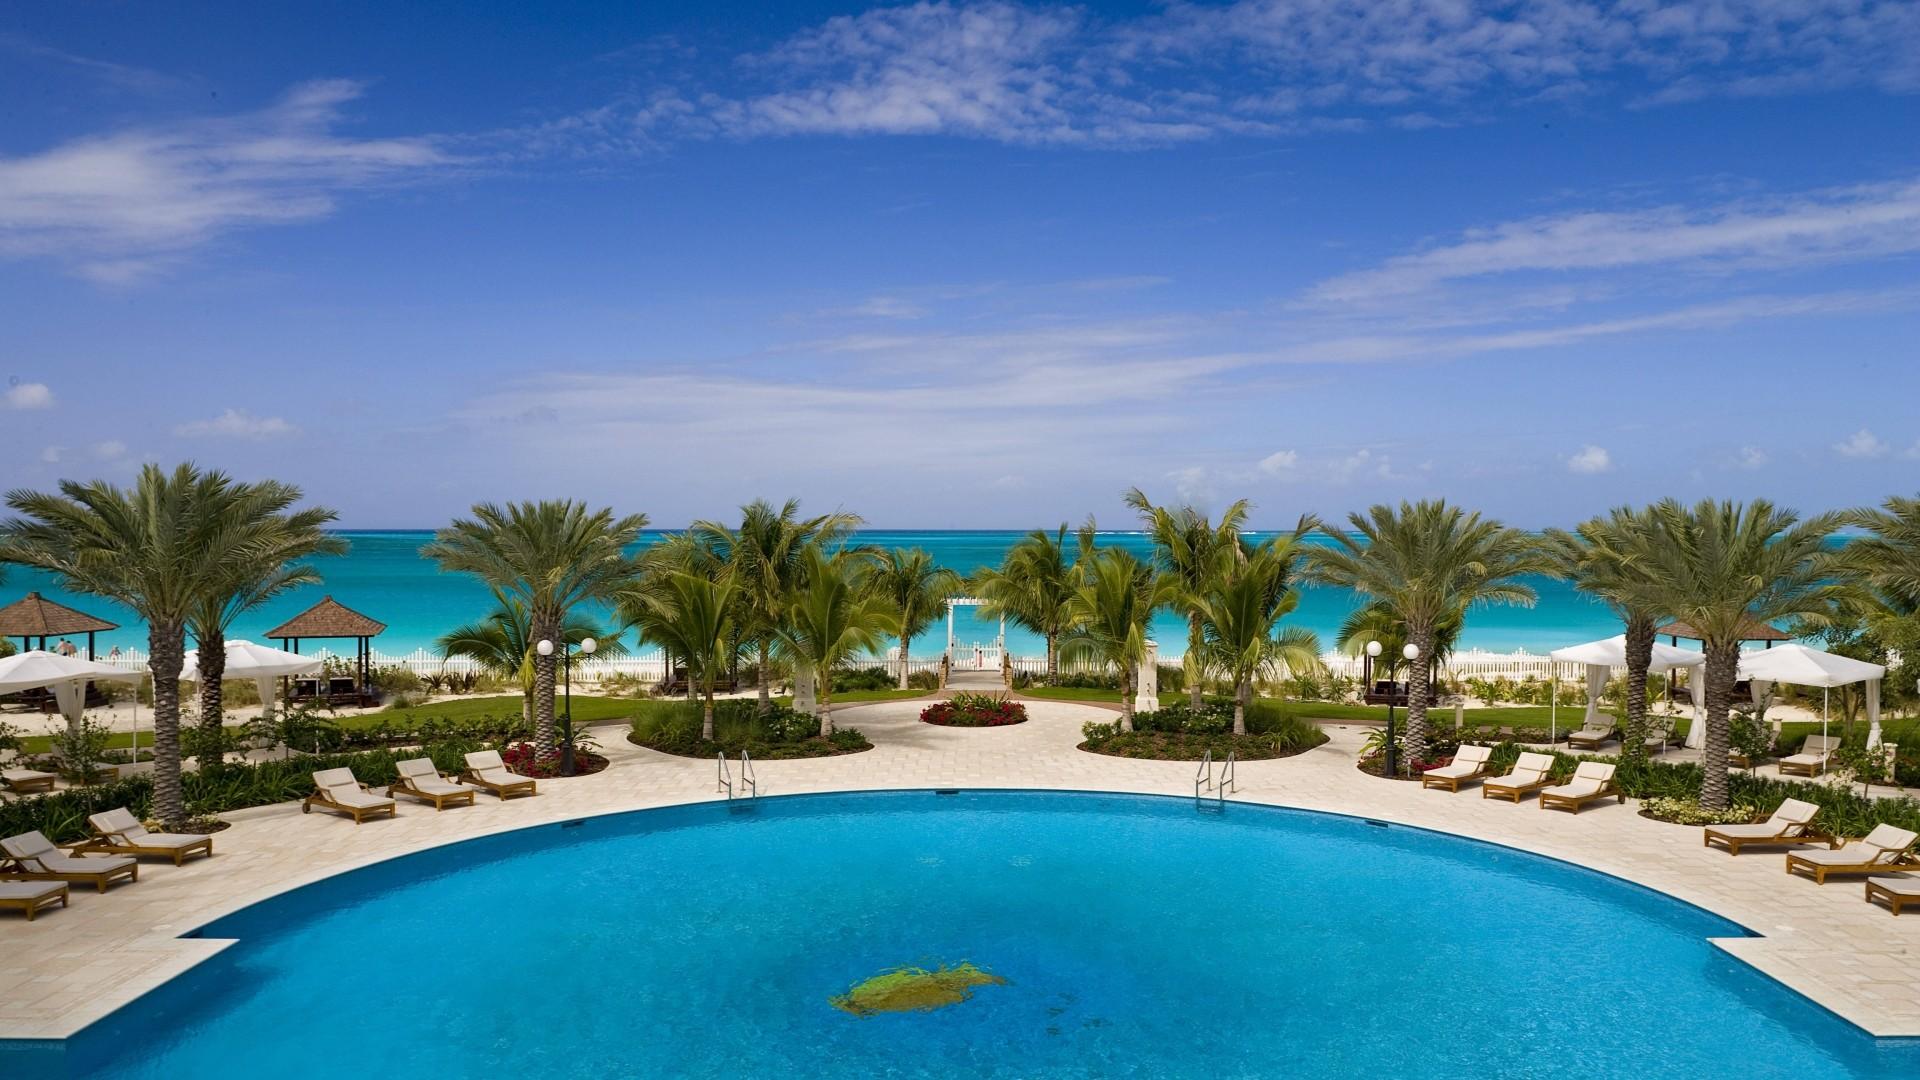 Wallpaper tropical, resort, palm trees, summer